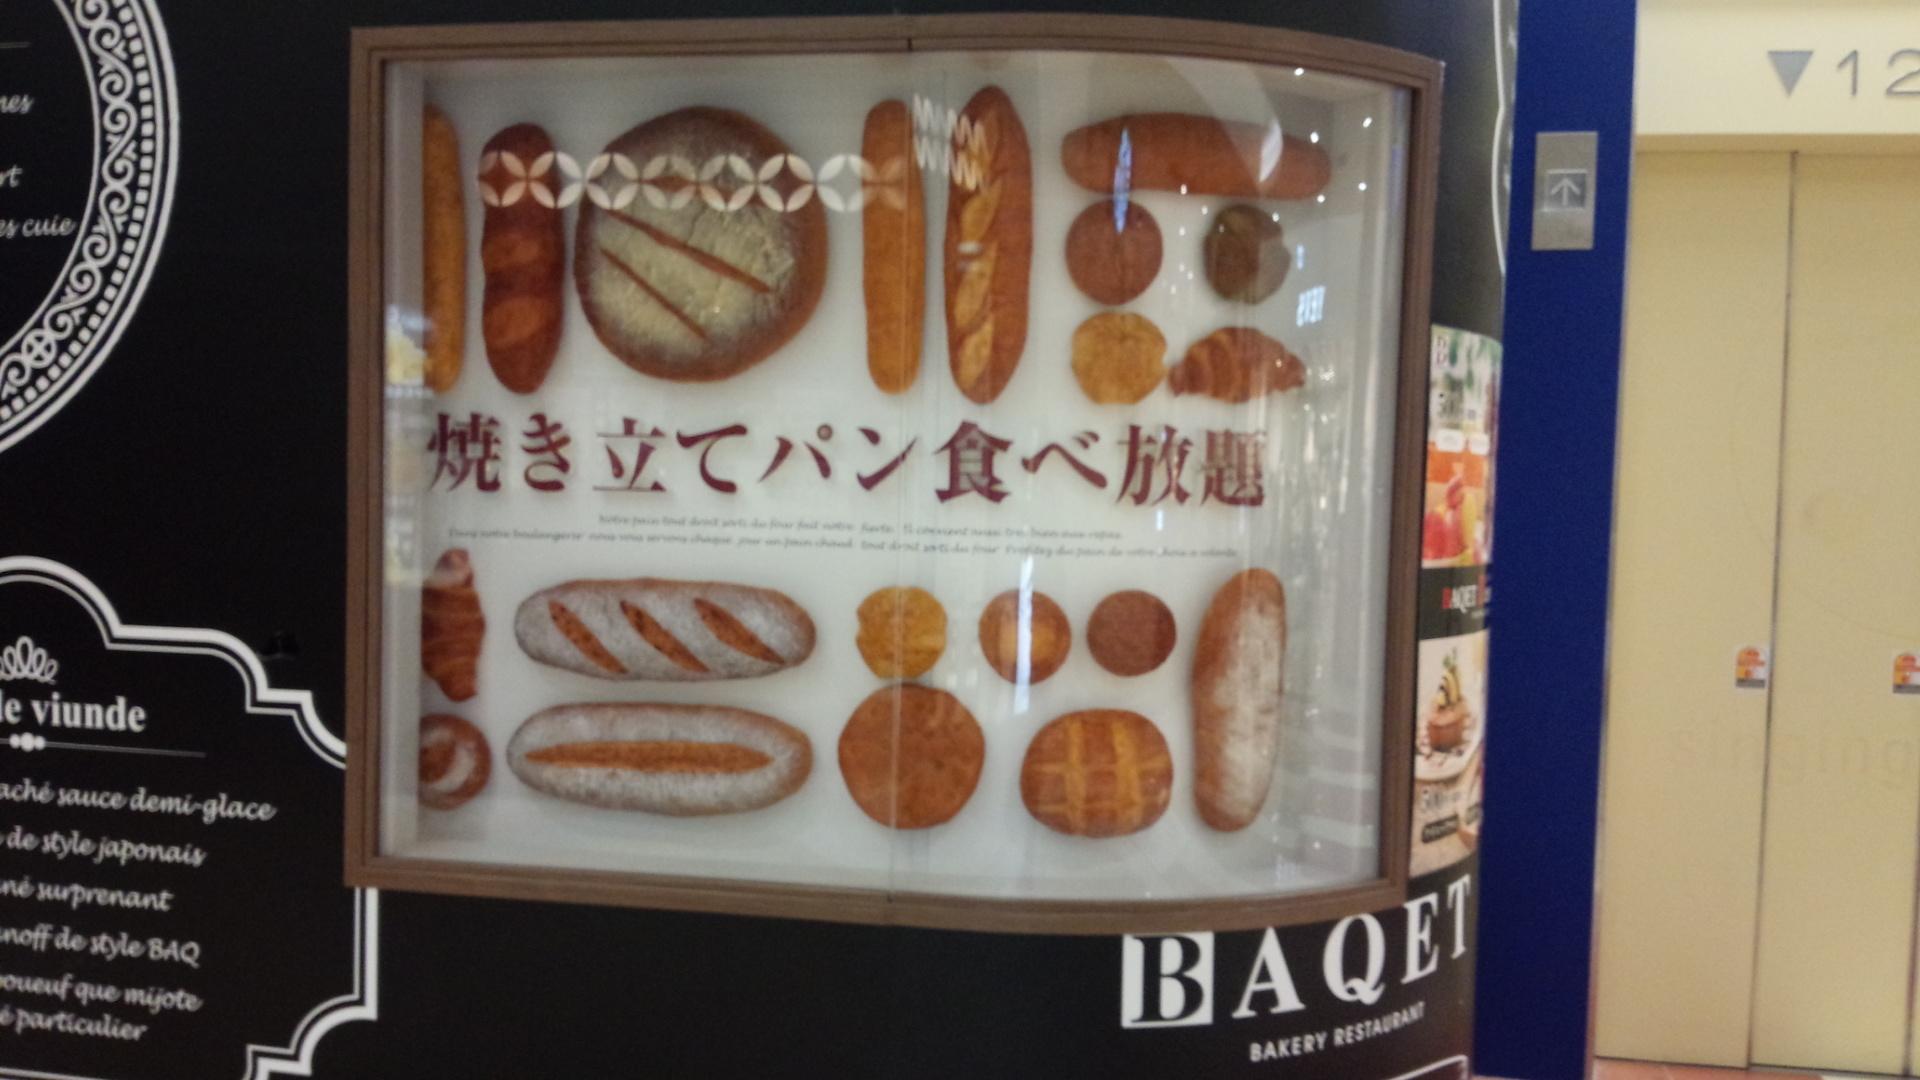 BAQET イオンモール鹿児島店